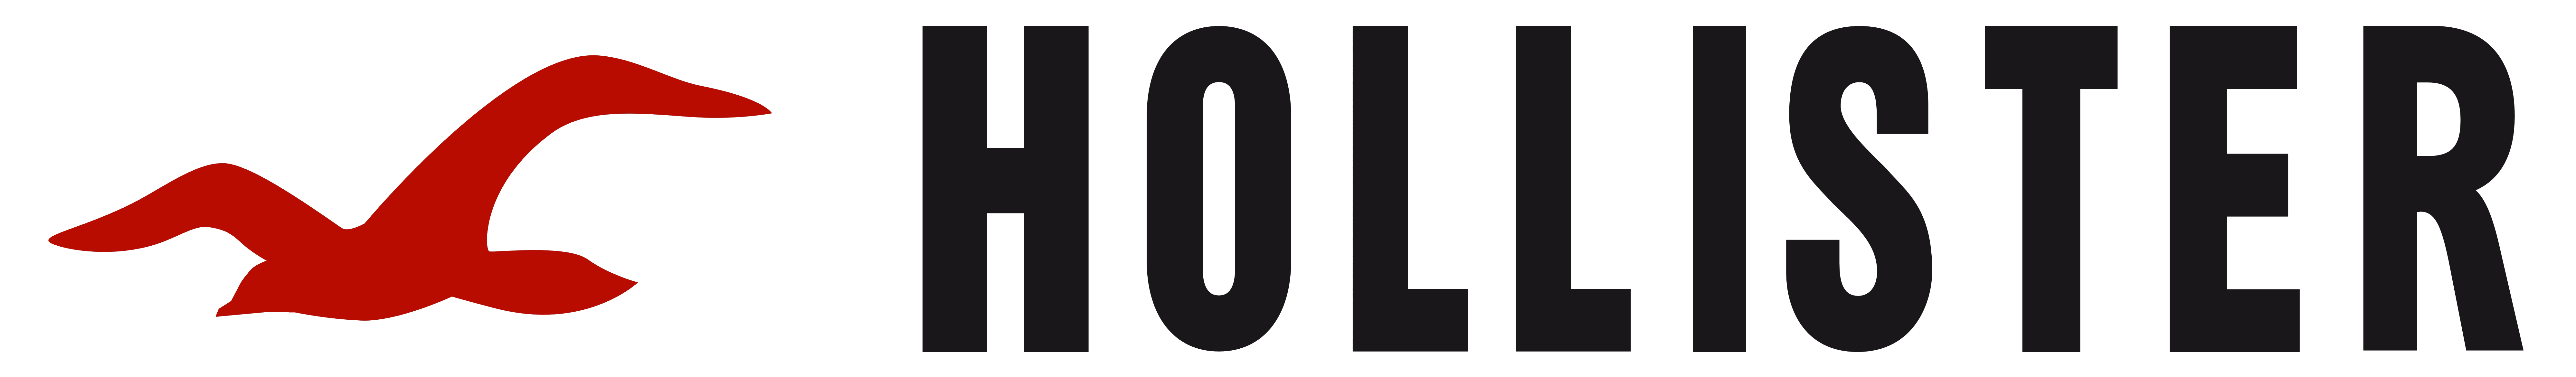 Image Gallery Hollister Logo